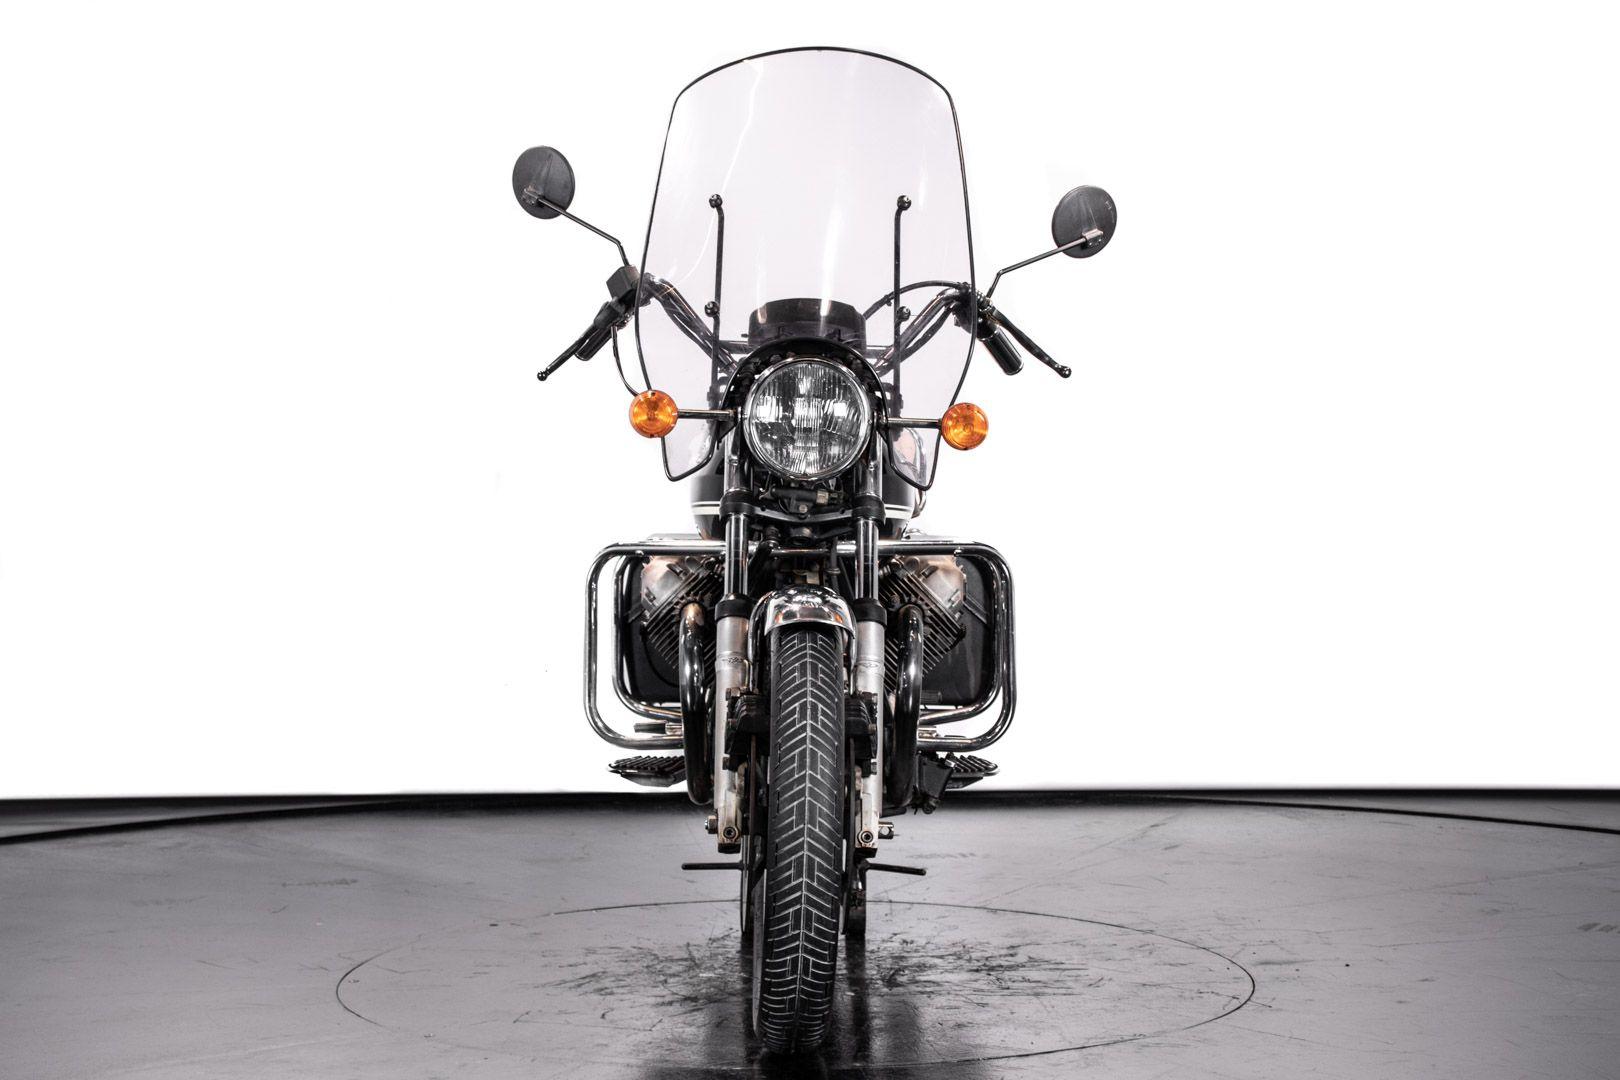 1981 Moto Guzzi 850 T3 California 83245